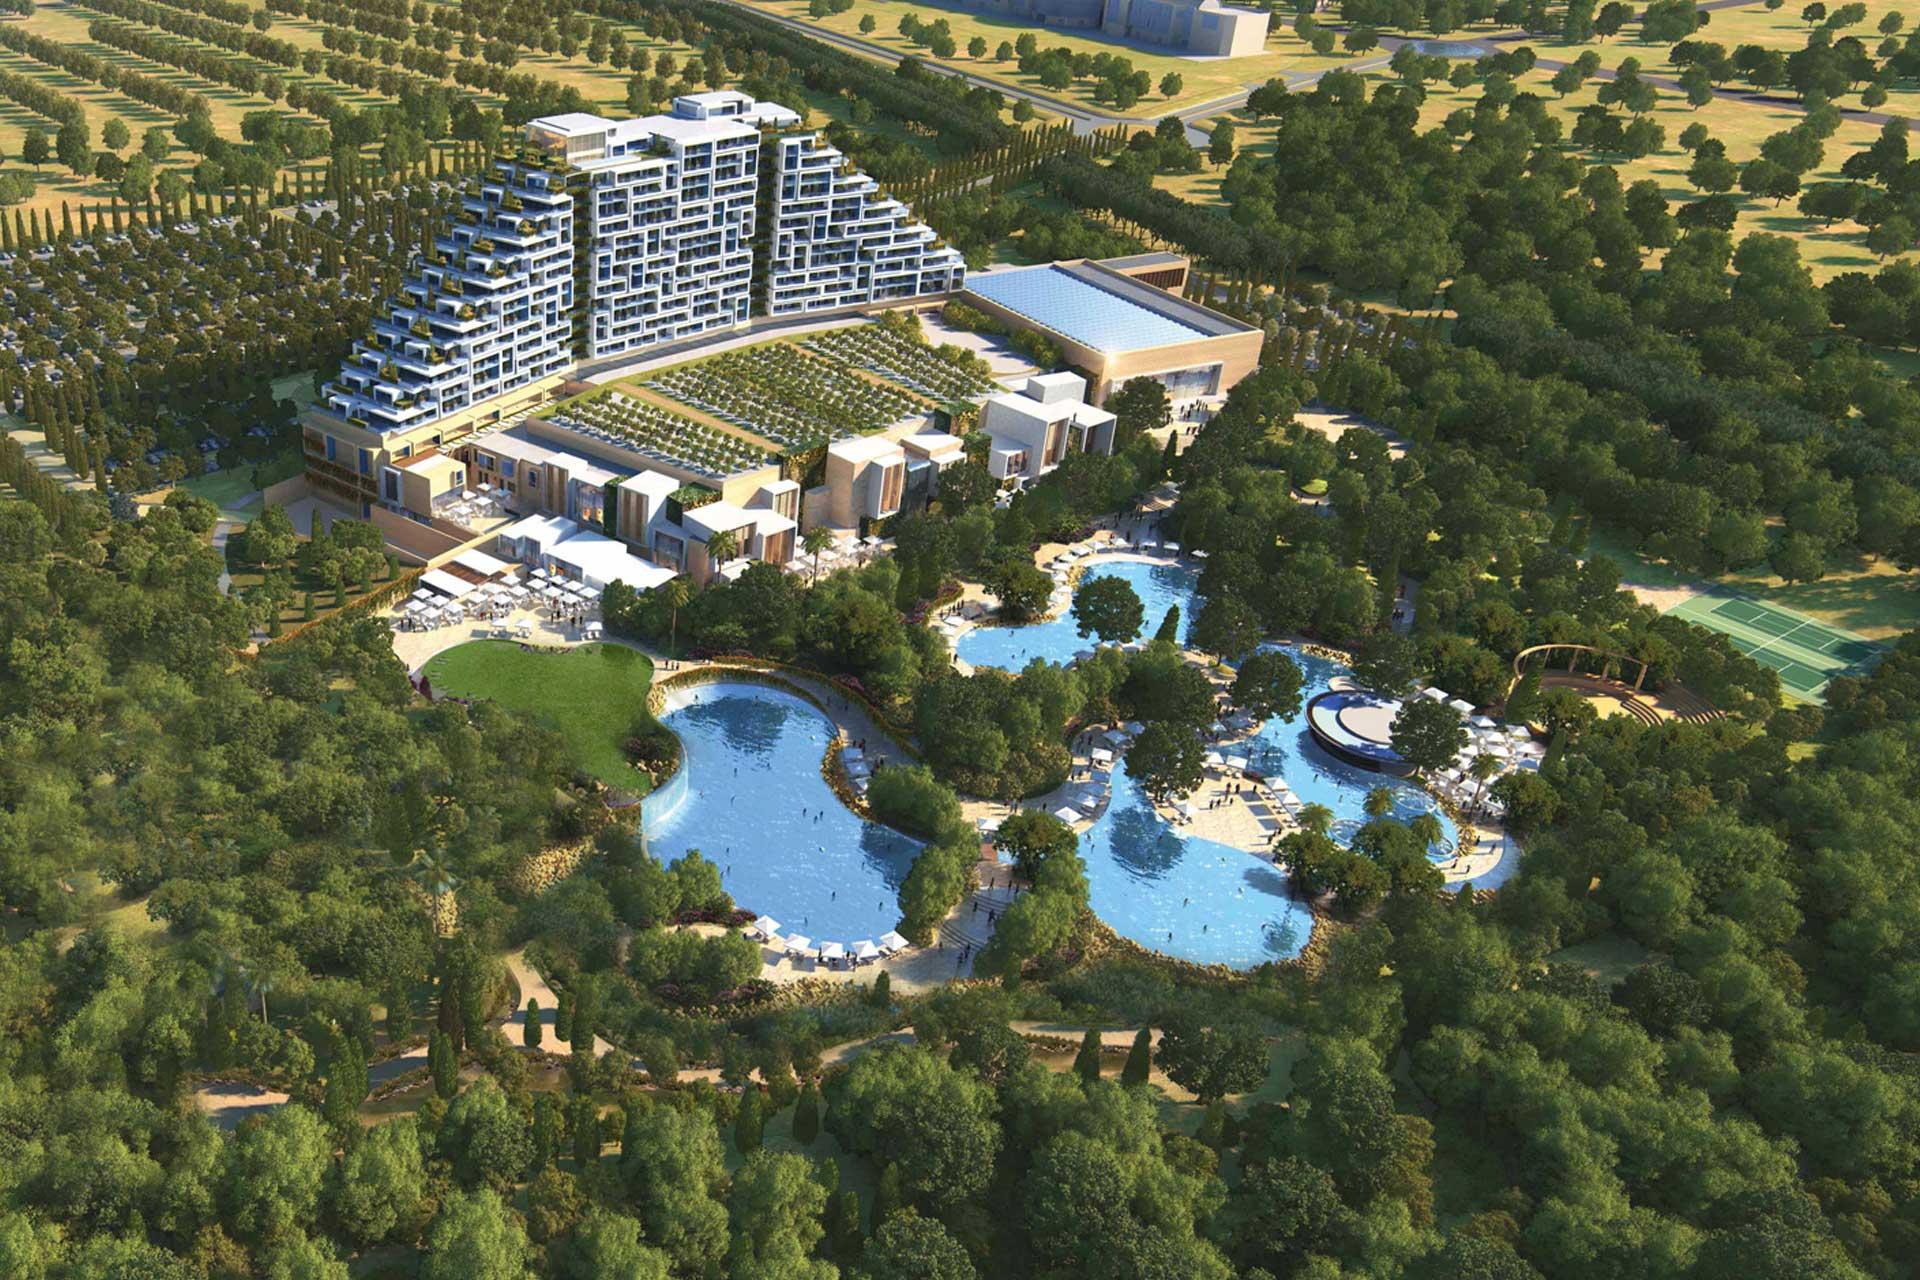 ELEMEC GBC - Projects, City of Dreams Mediterranean